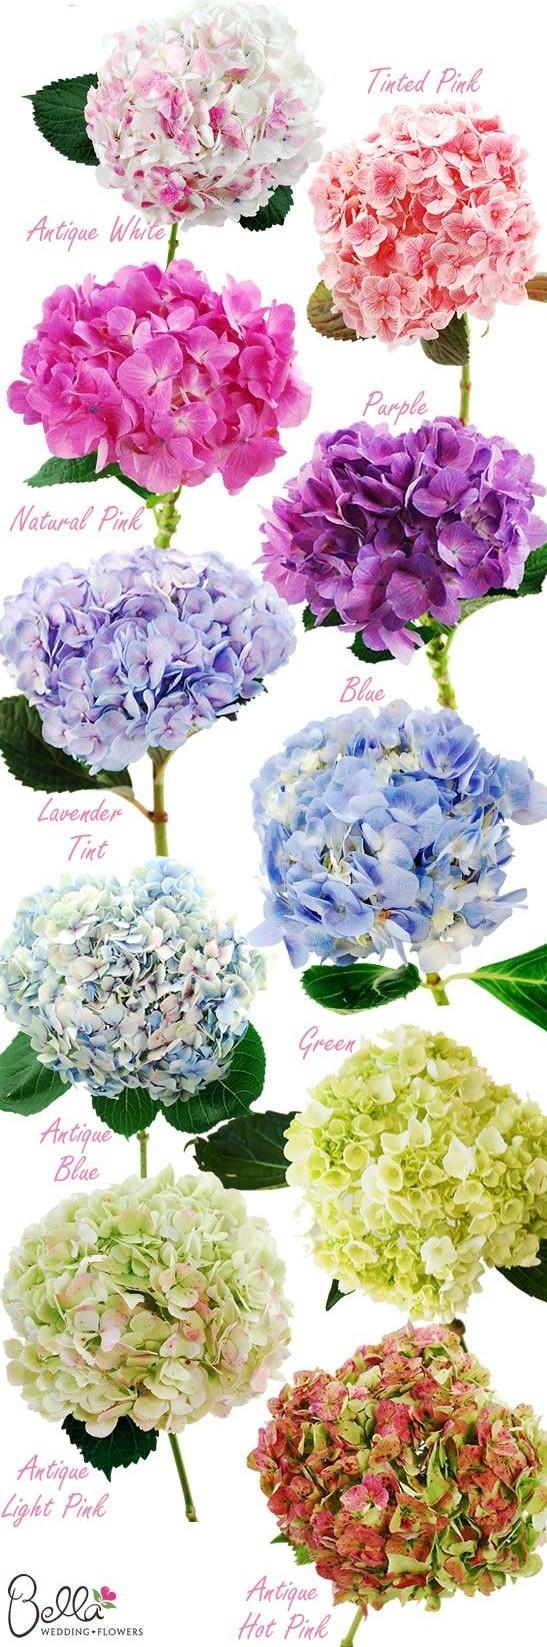 Colores de hortensias - bodas